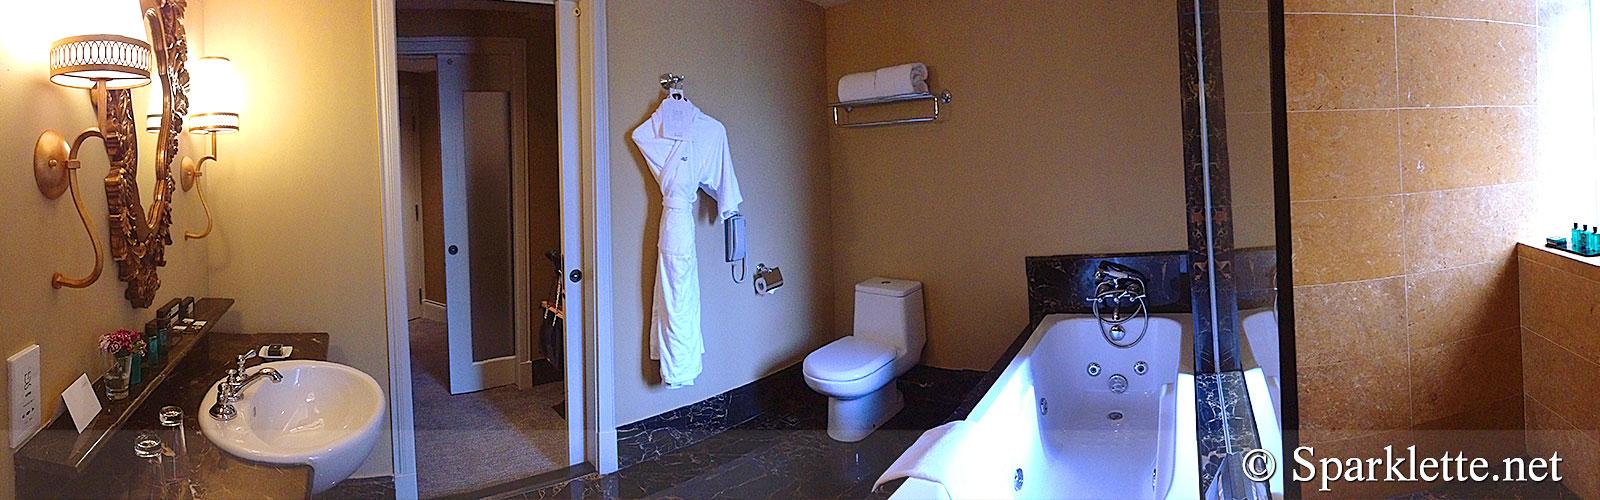 The Scarlet Hotel Splendour Suite Bathroom